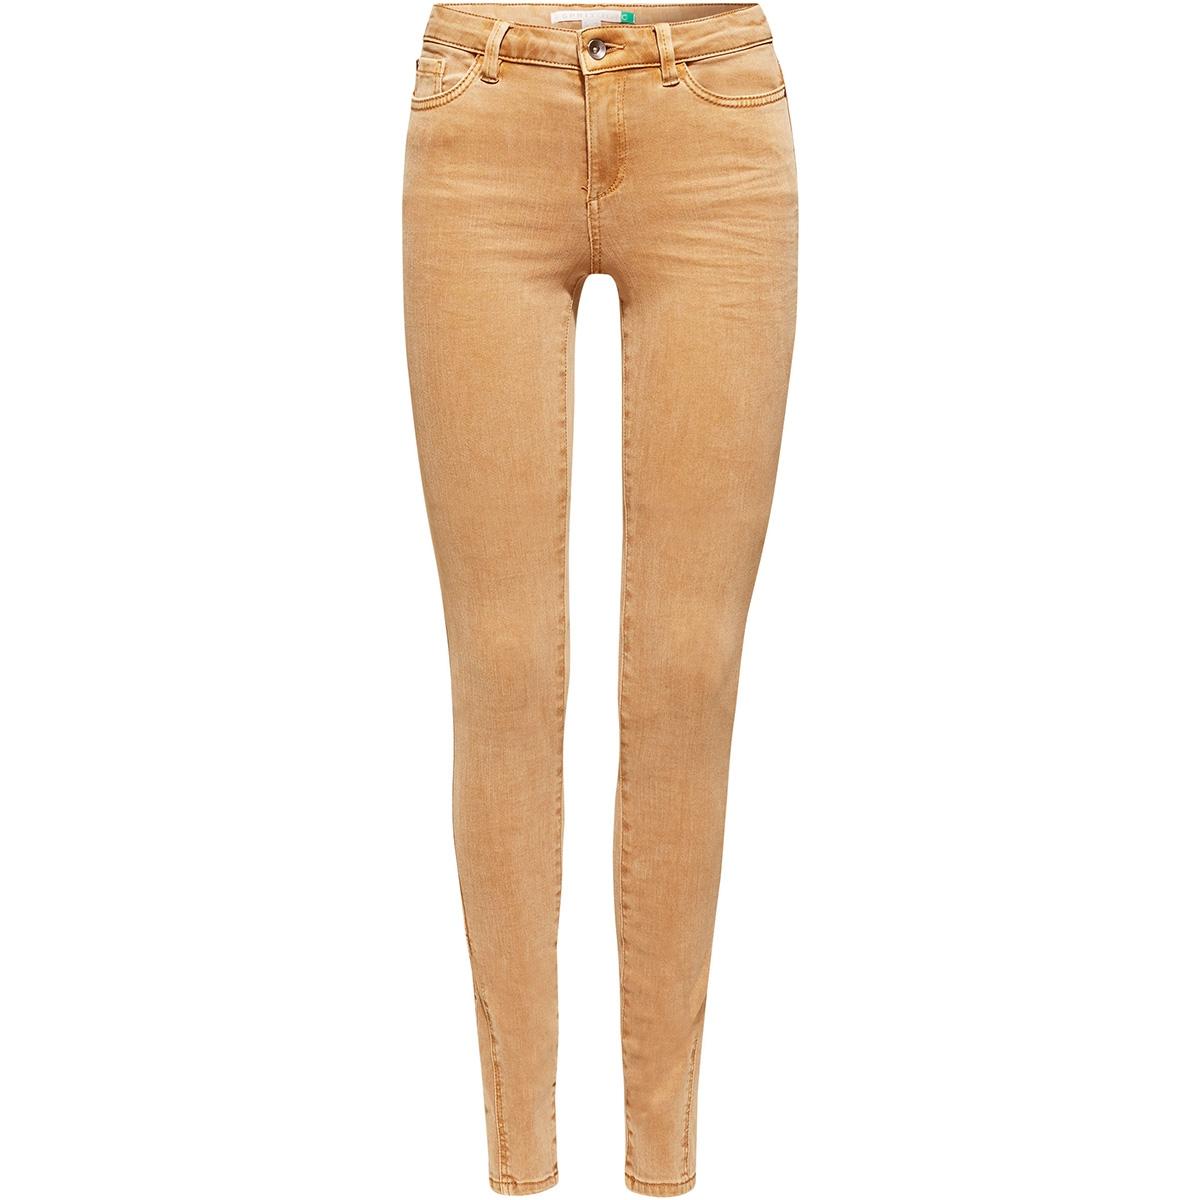 shaping broek met gewassen look 099ee1b019 esprit jeans e230